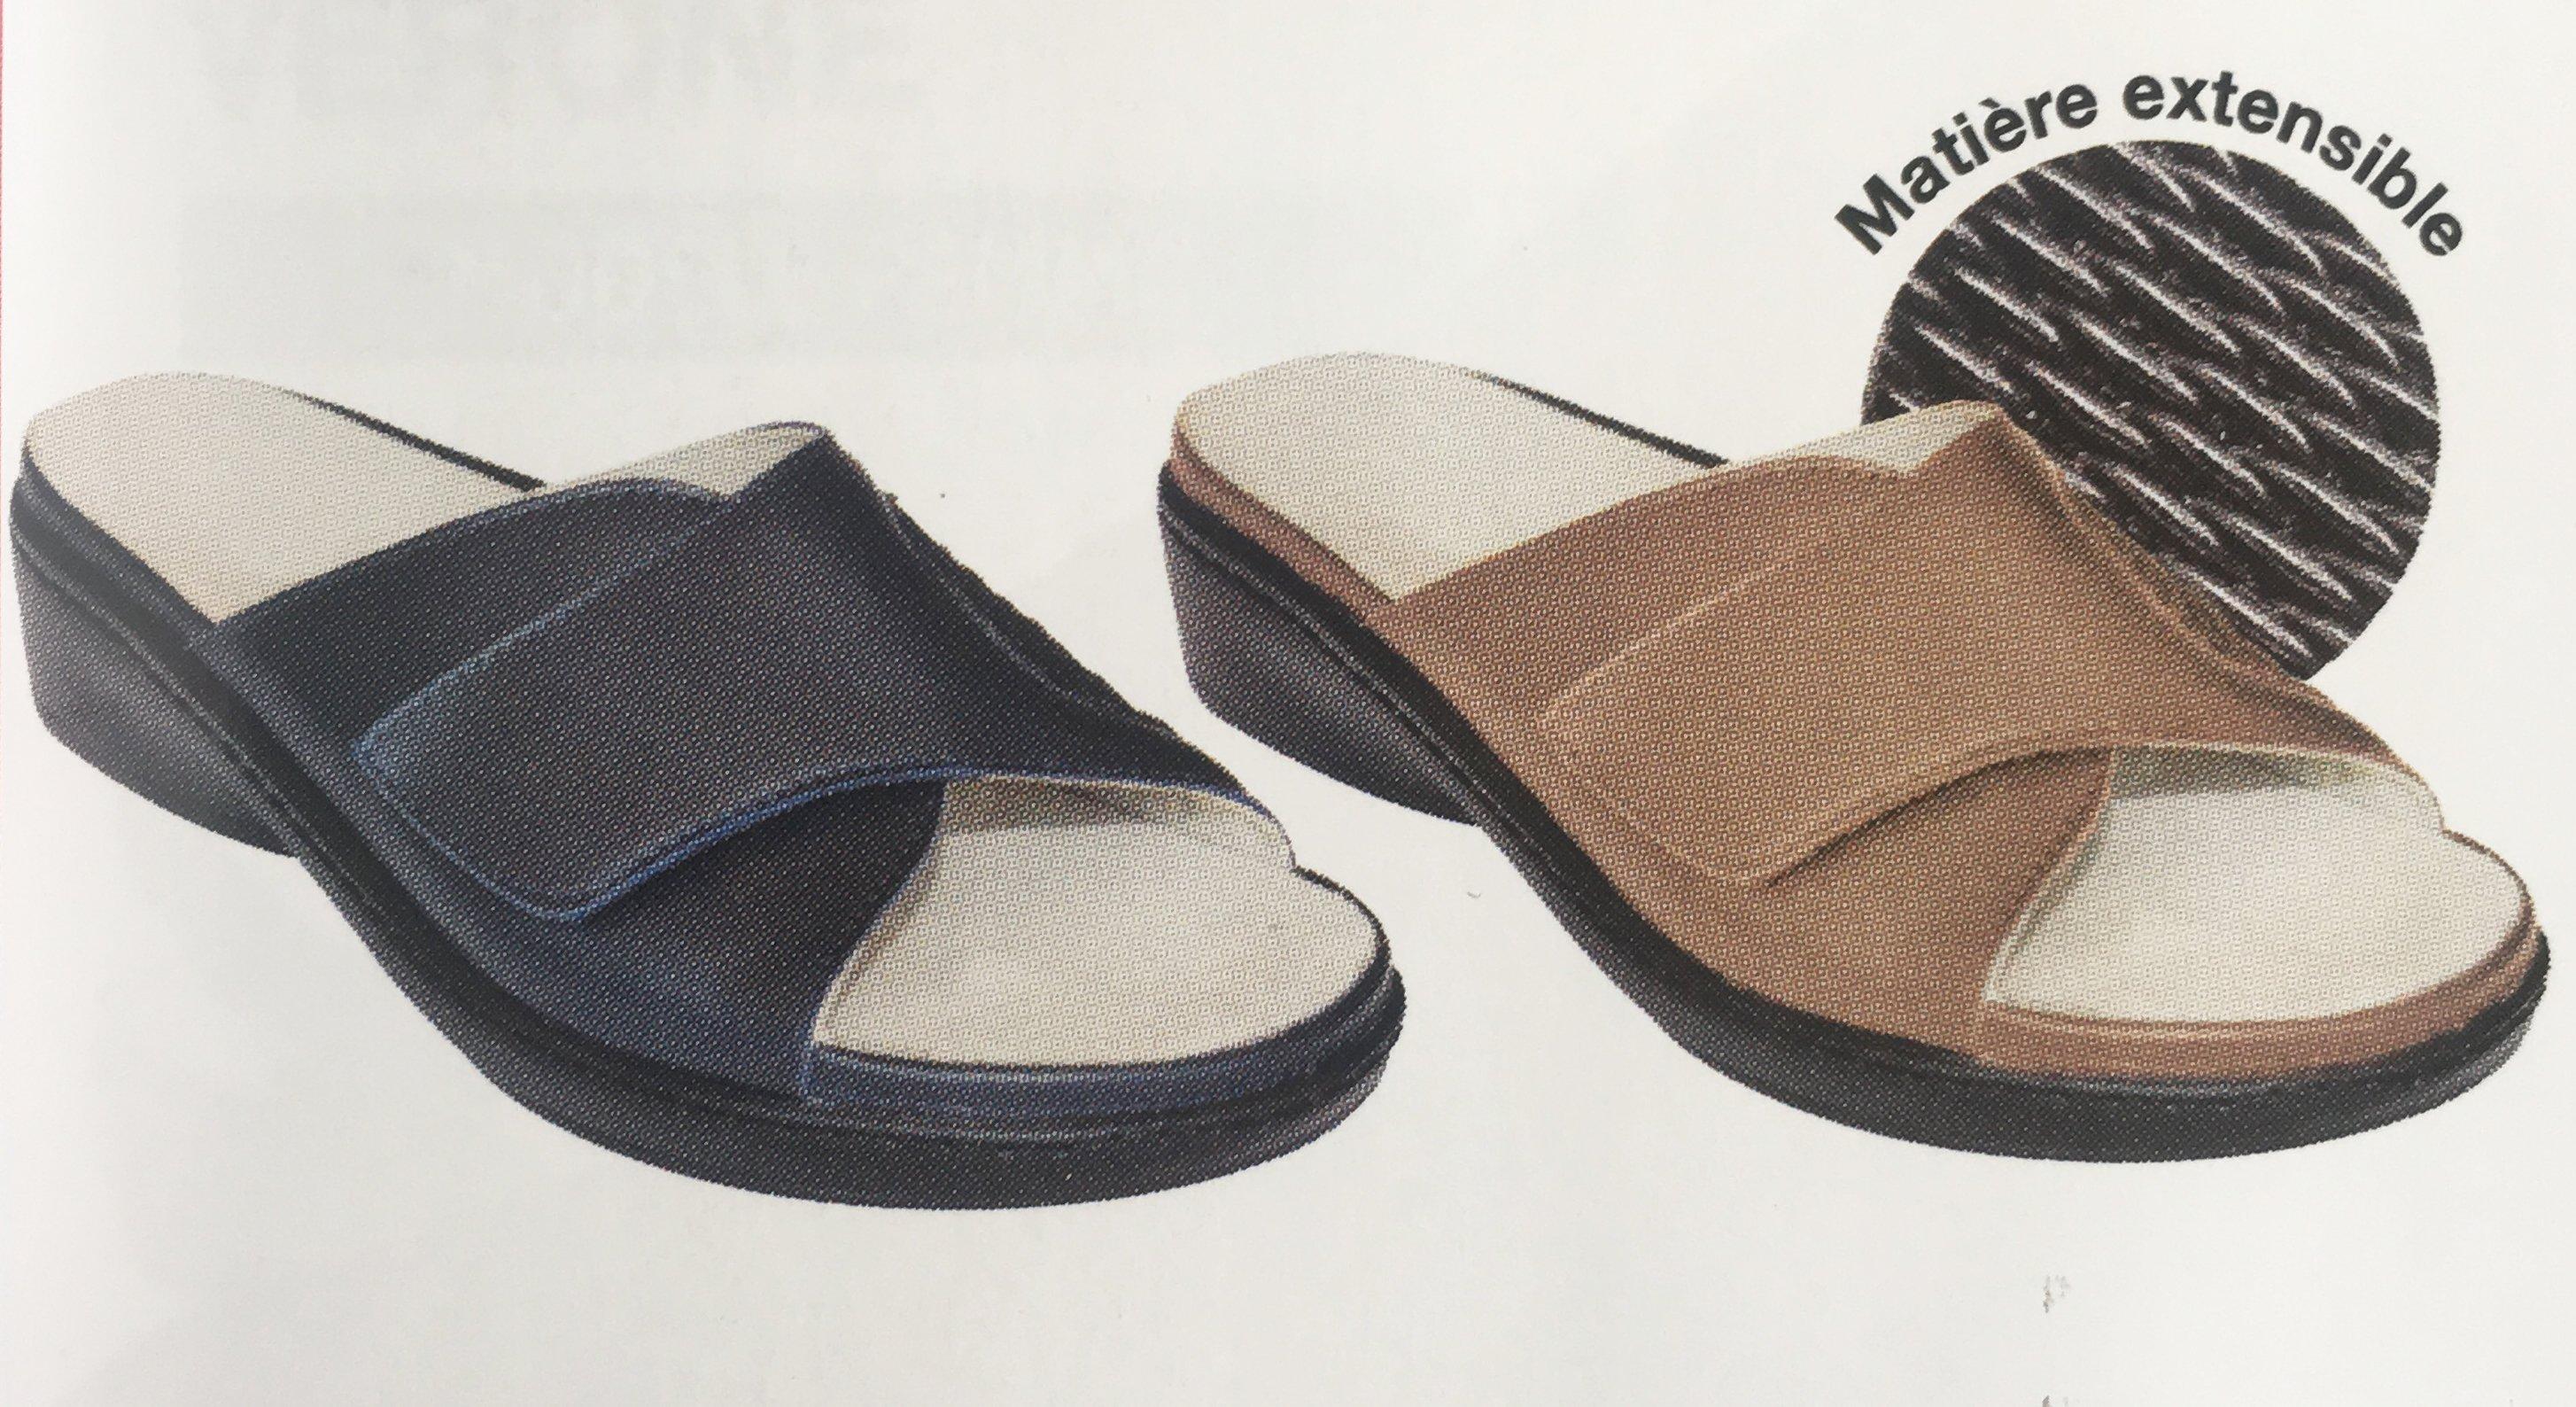 a917d9feda5d37 Podactiv chaussure de confort Gallia HV femme Gibaud ...